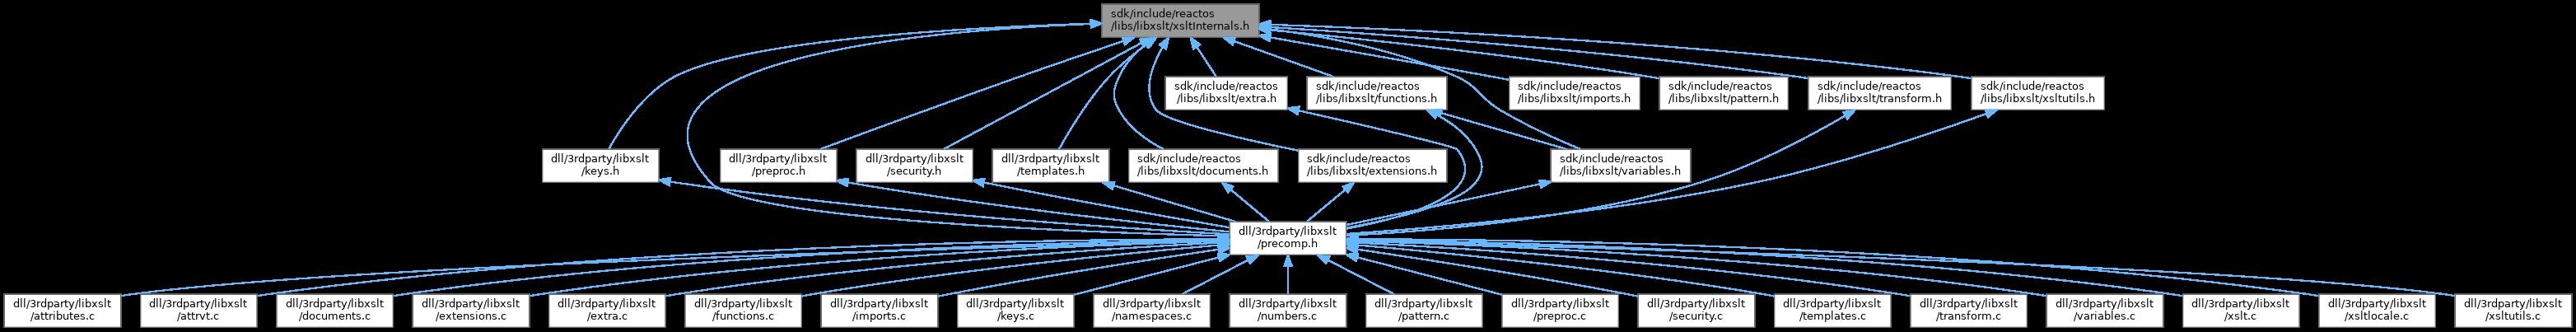 ReactOS: sdk/include/reactos/libs/libxslt/xsltInternals h